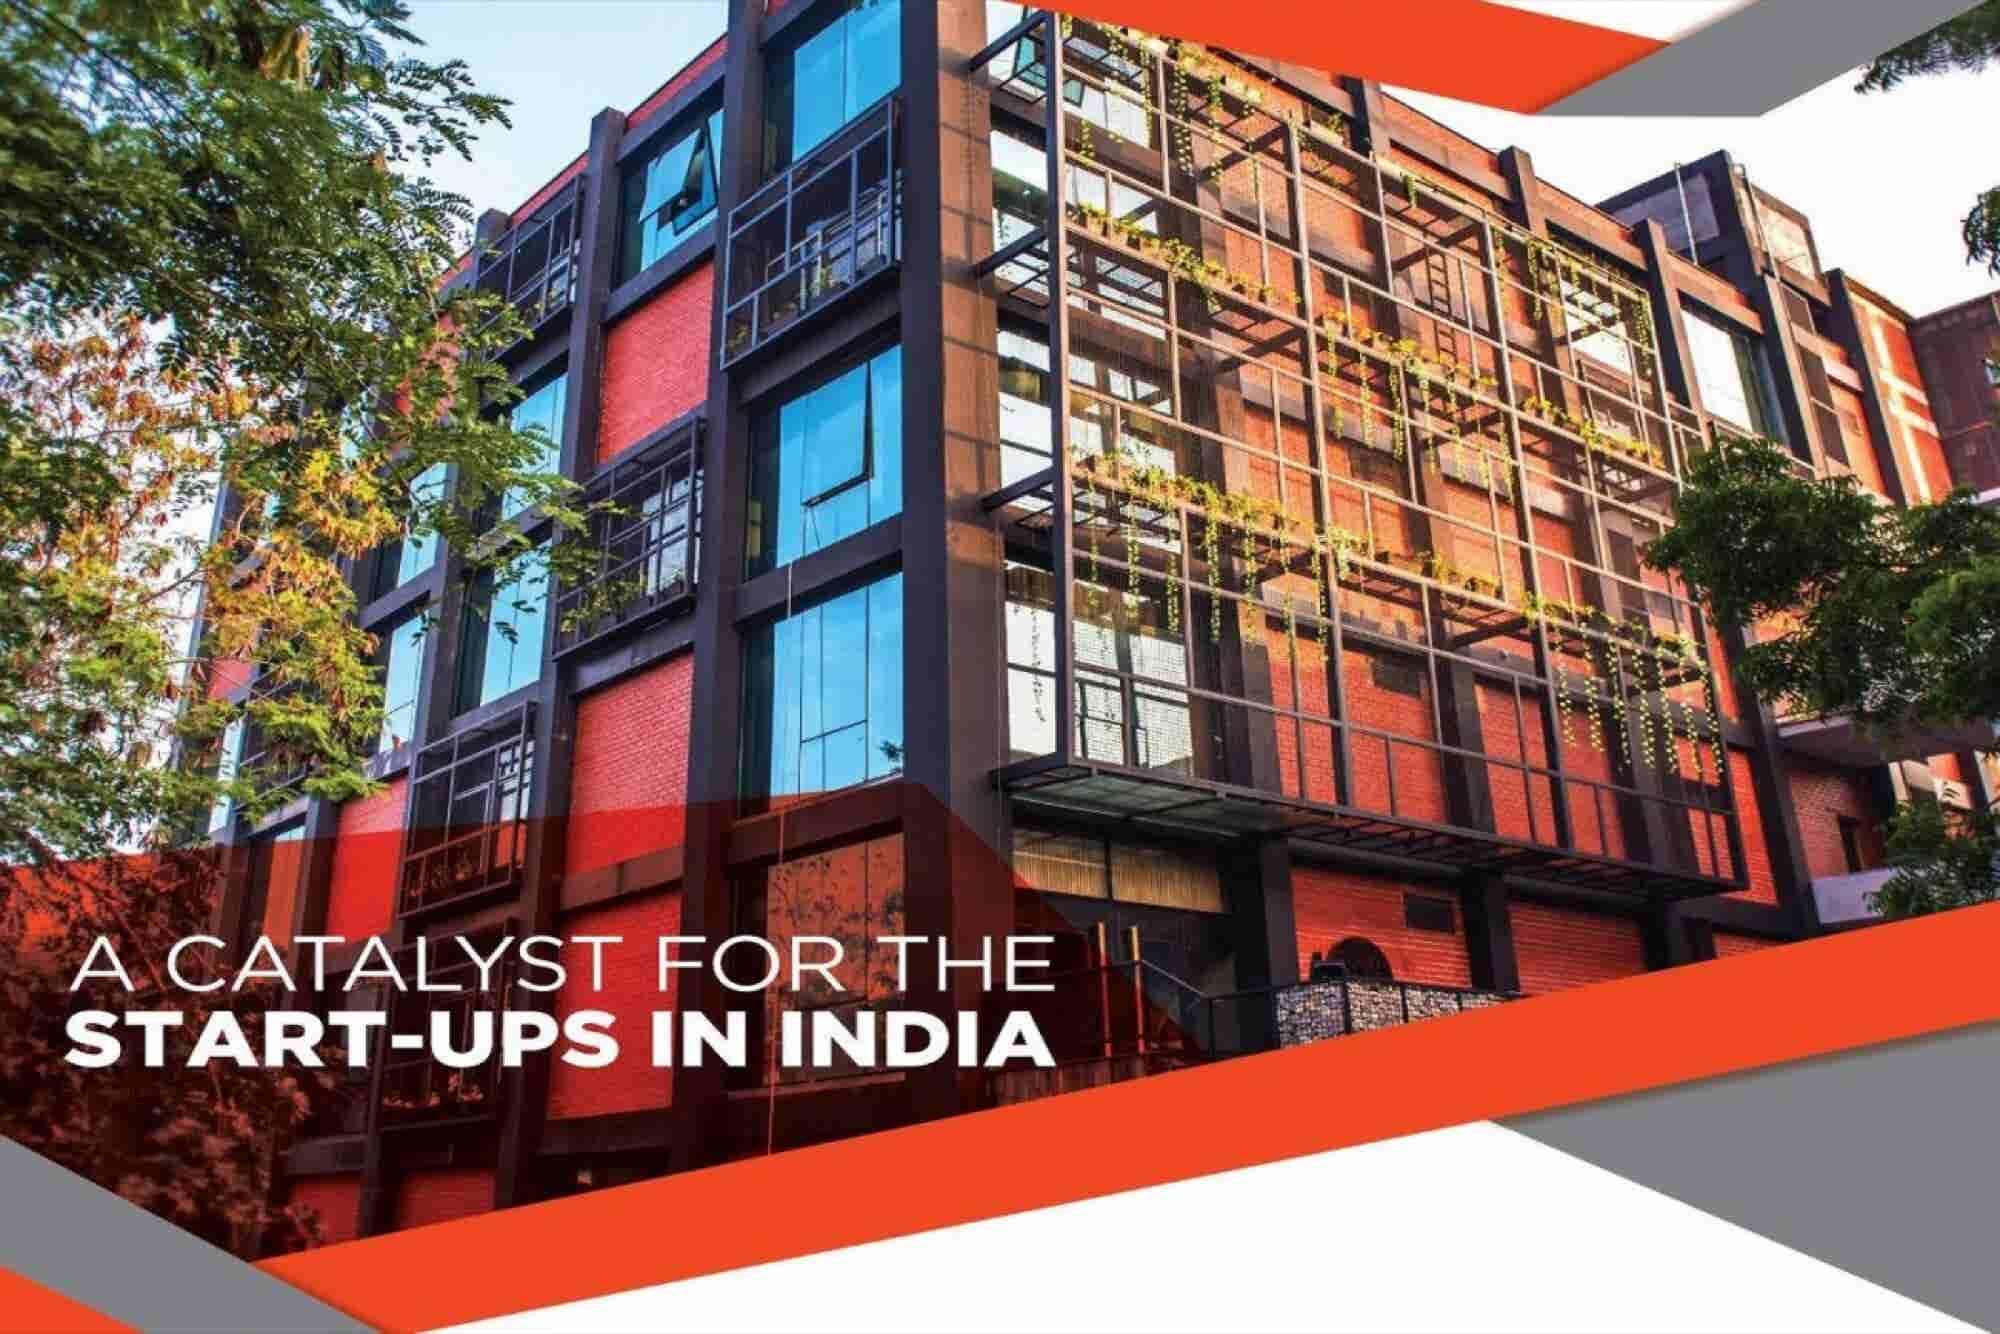 Start-ups, Take Note of One of India's Biggest Incubators